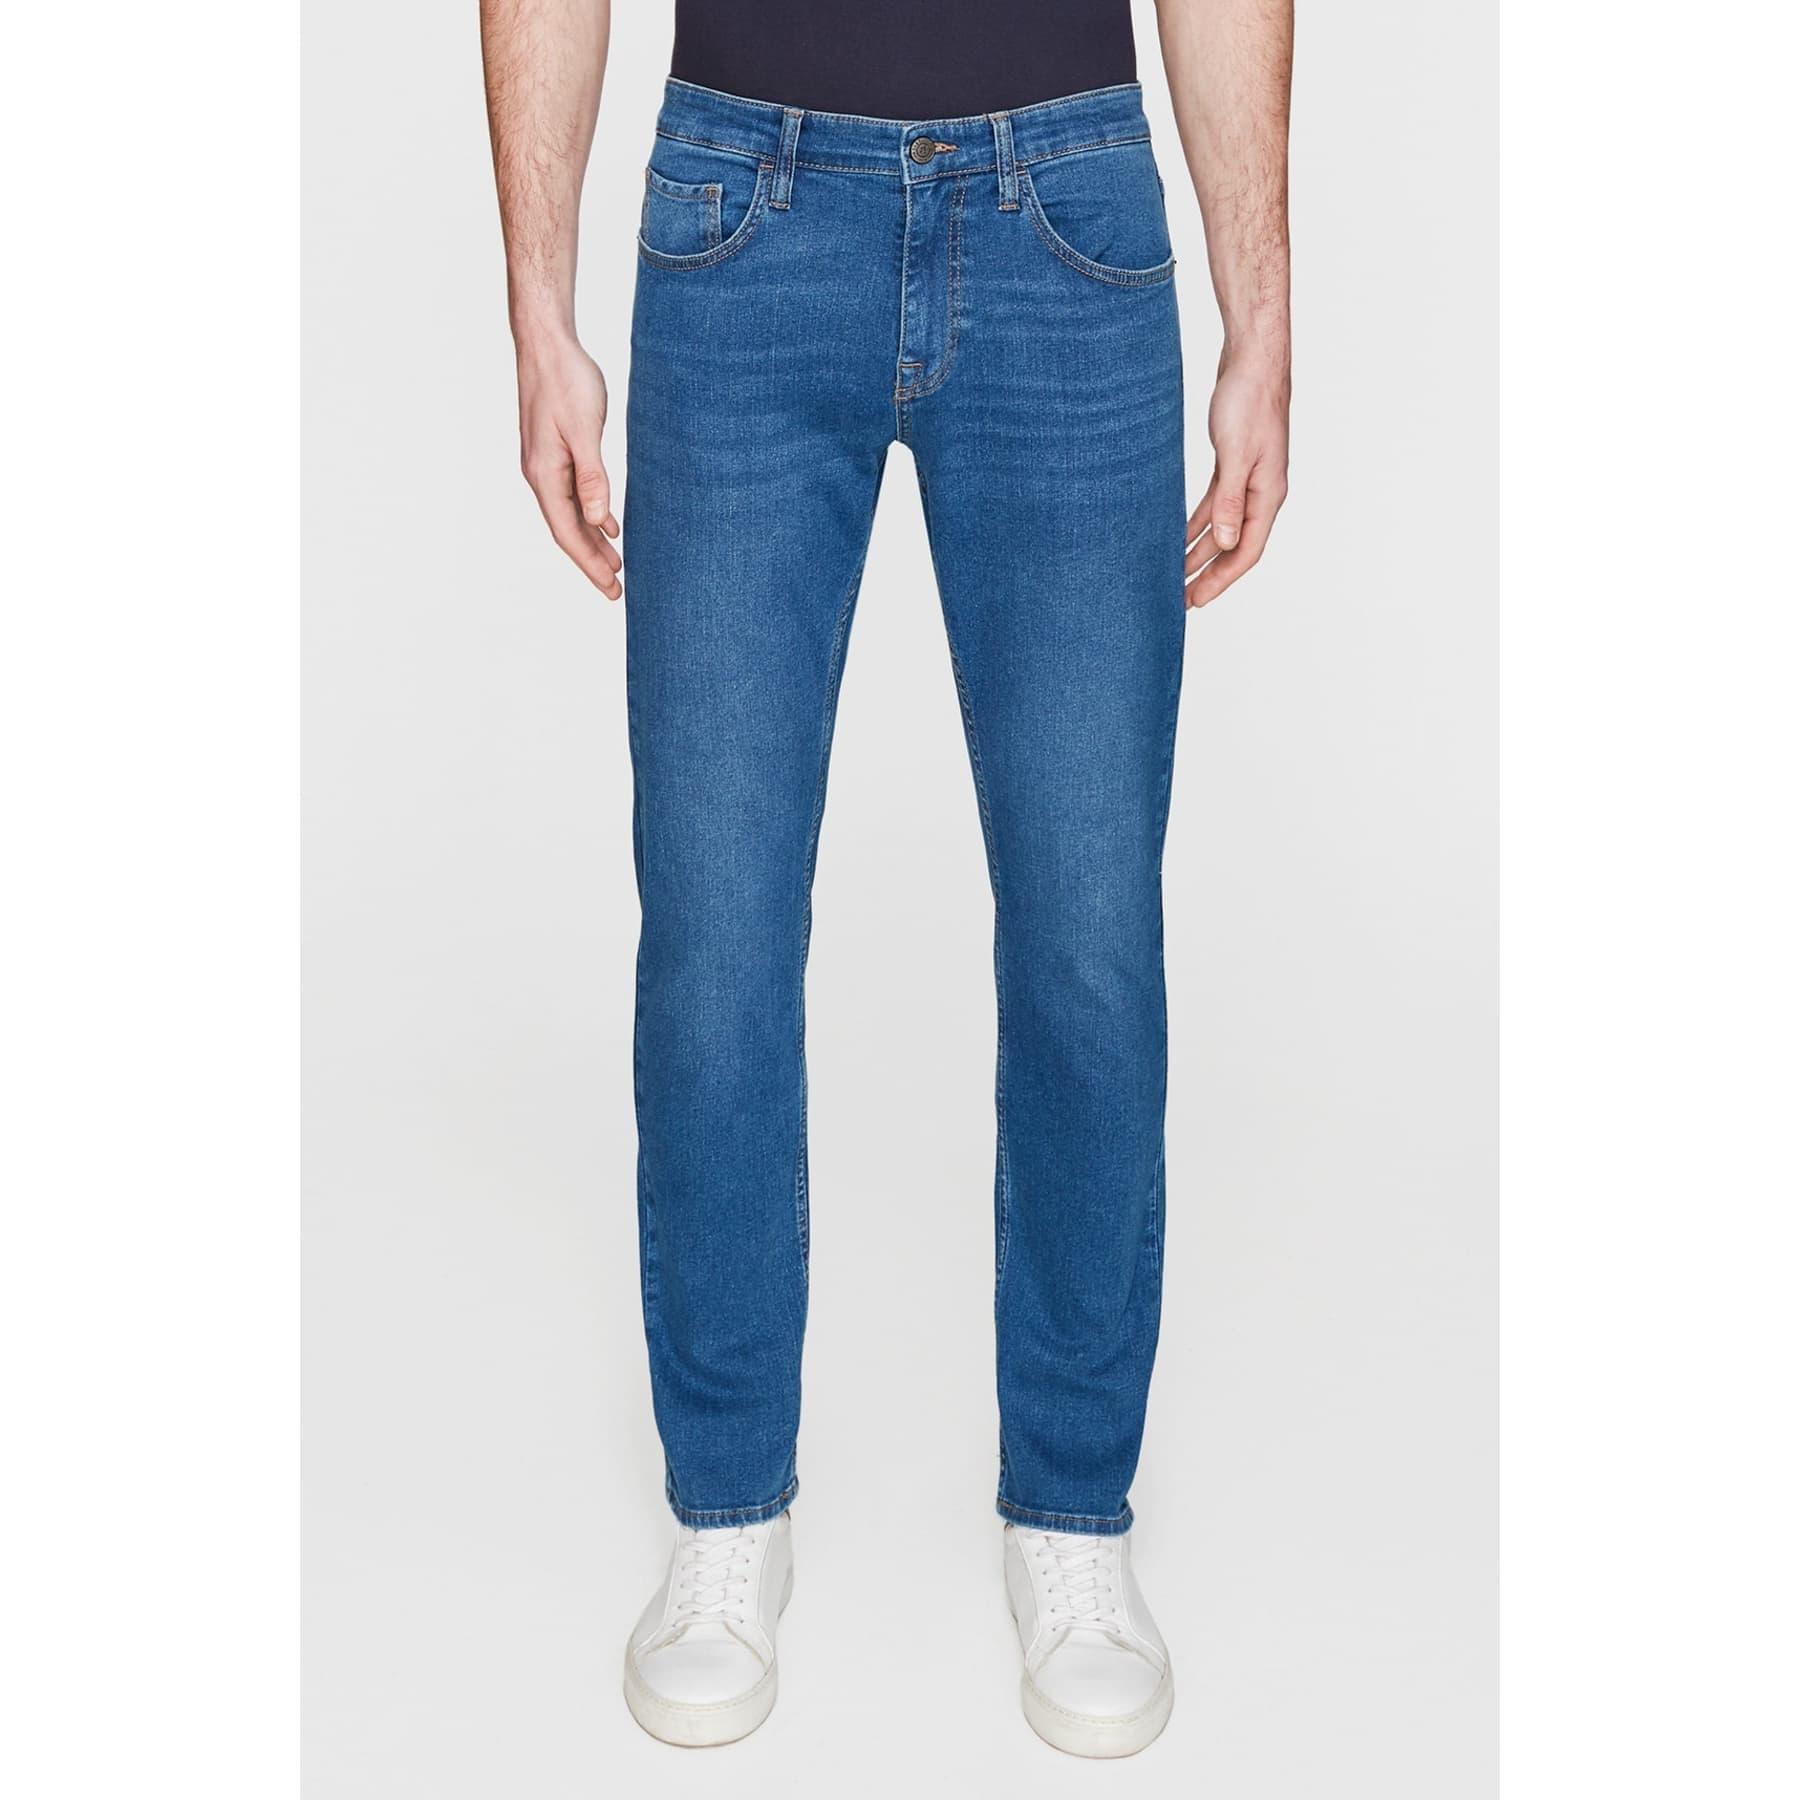 Mavi Jeans Marcus Erkek Kot Pantolon